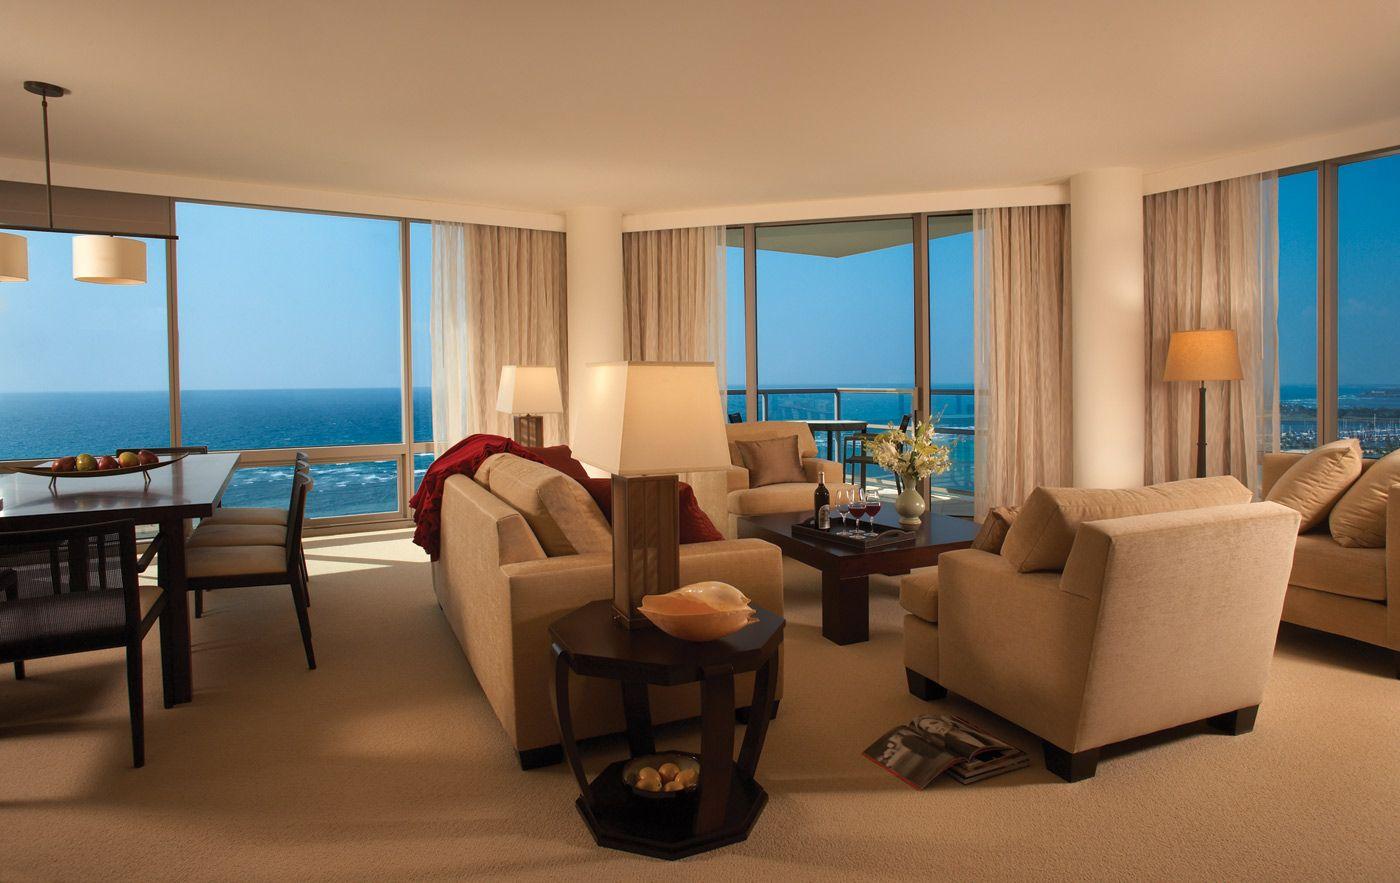 Great room deals for trump international hotel waikiki beach walk always on the cutting edge trump international hotel tower waikiki beach walk is a